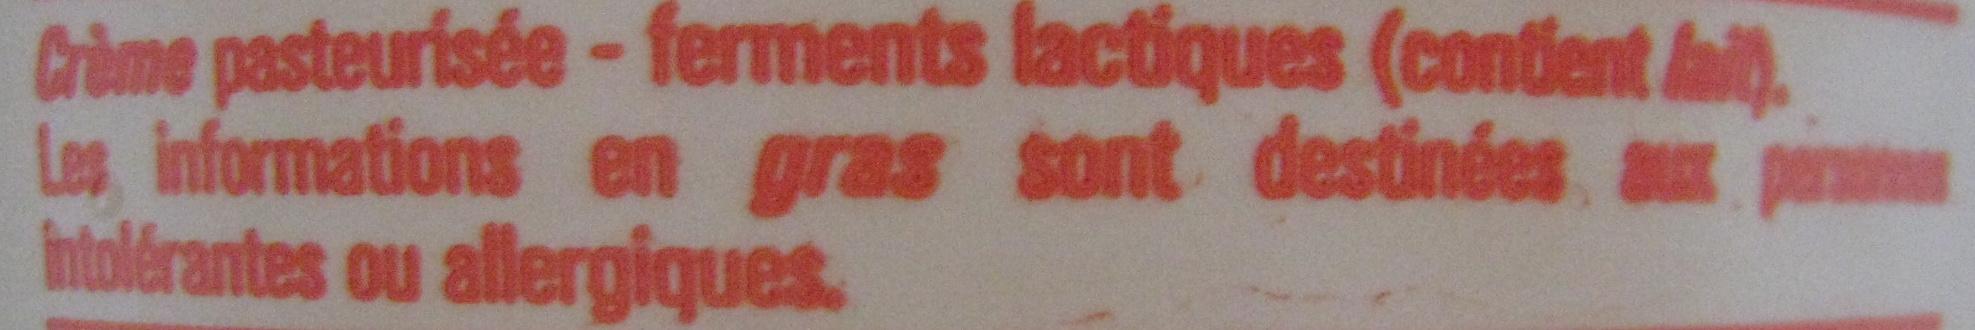 Crème fraîche (30 % MG) - Ingrediënten - fr